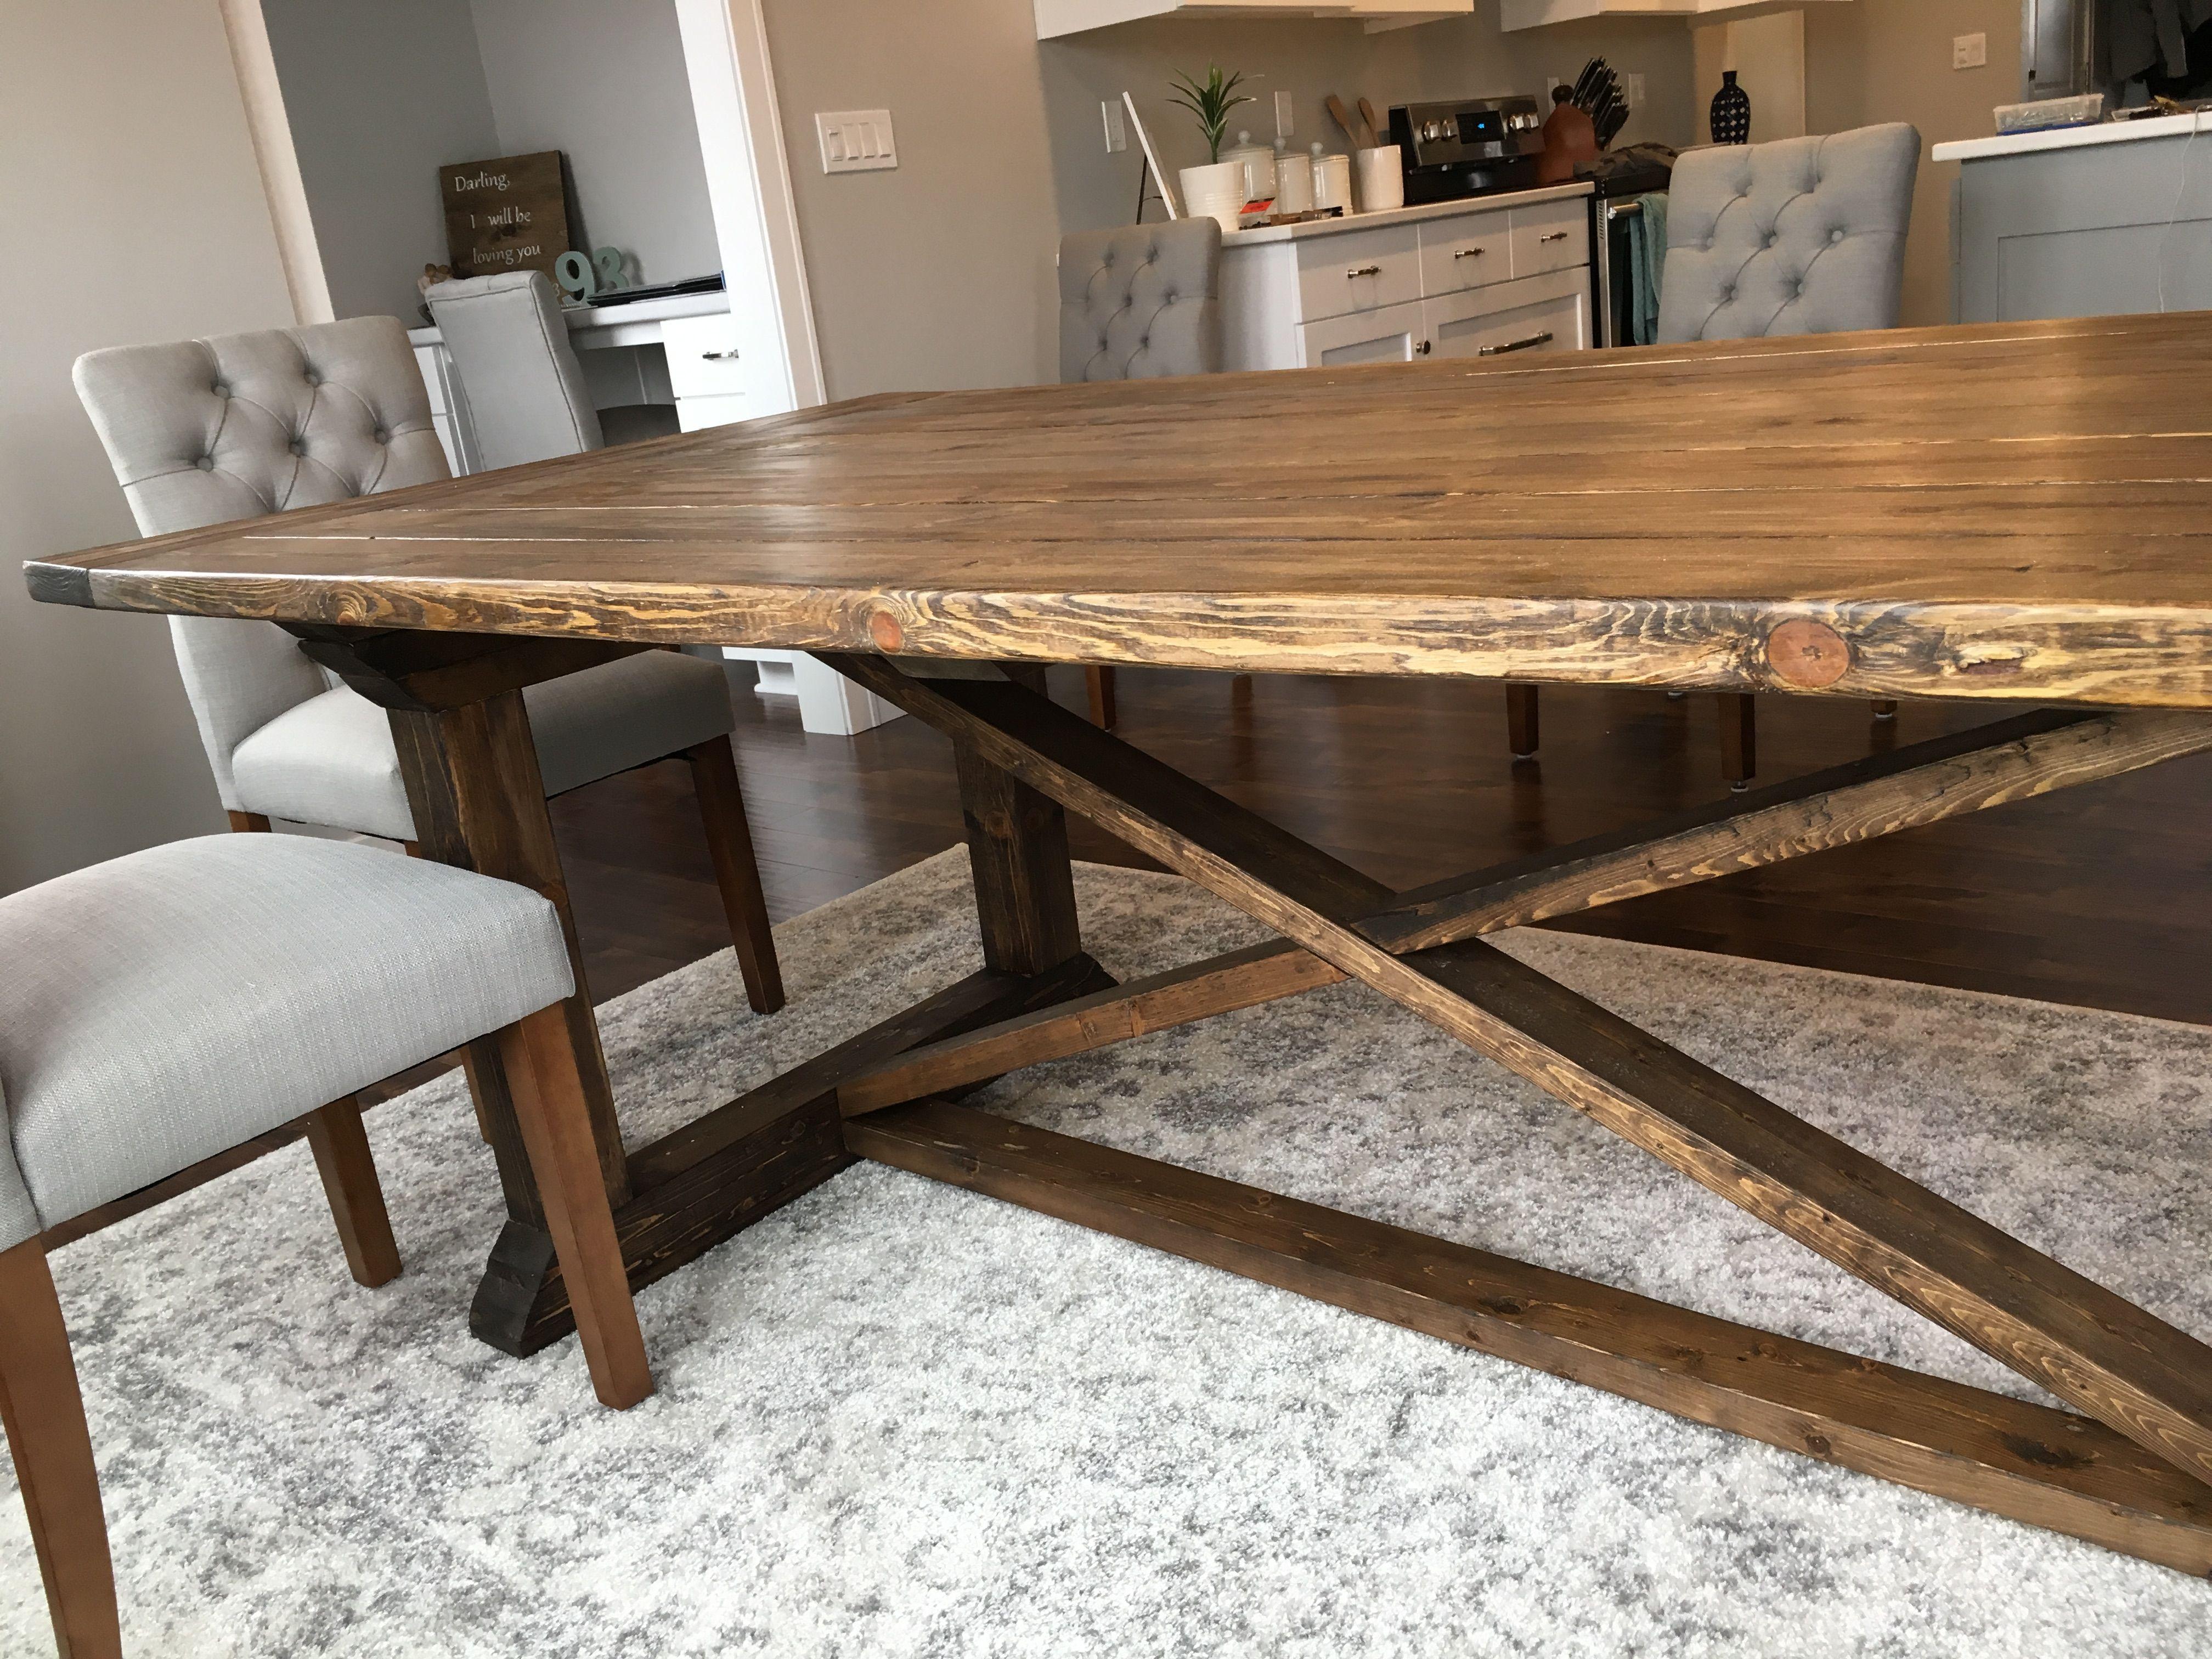 Rekourt Table Build Diy Projects Farmhouse Dining Table